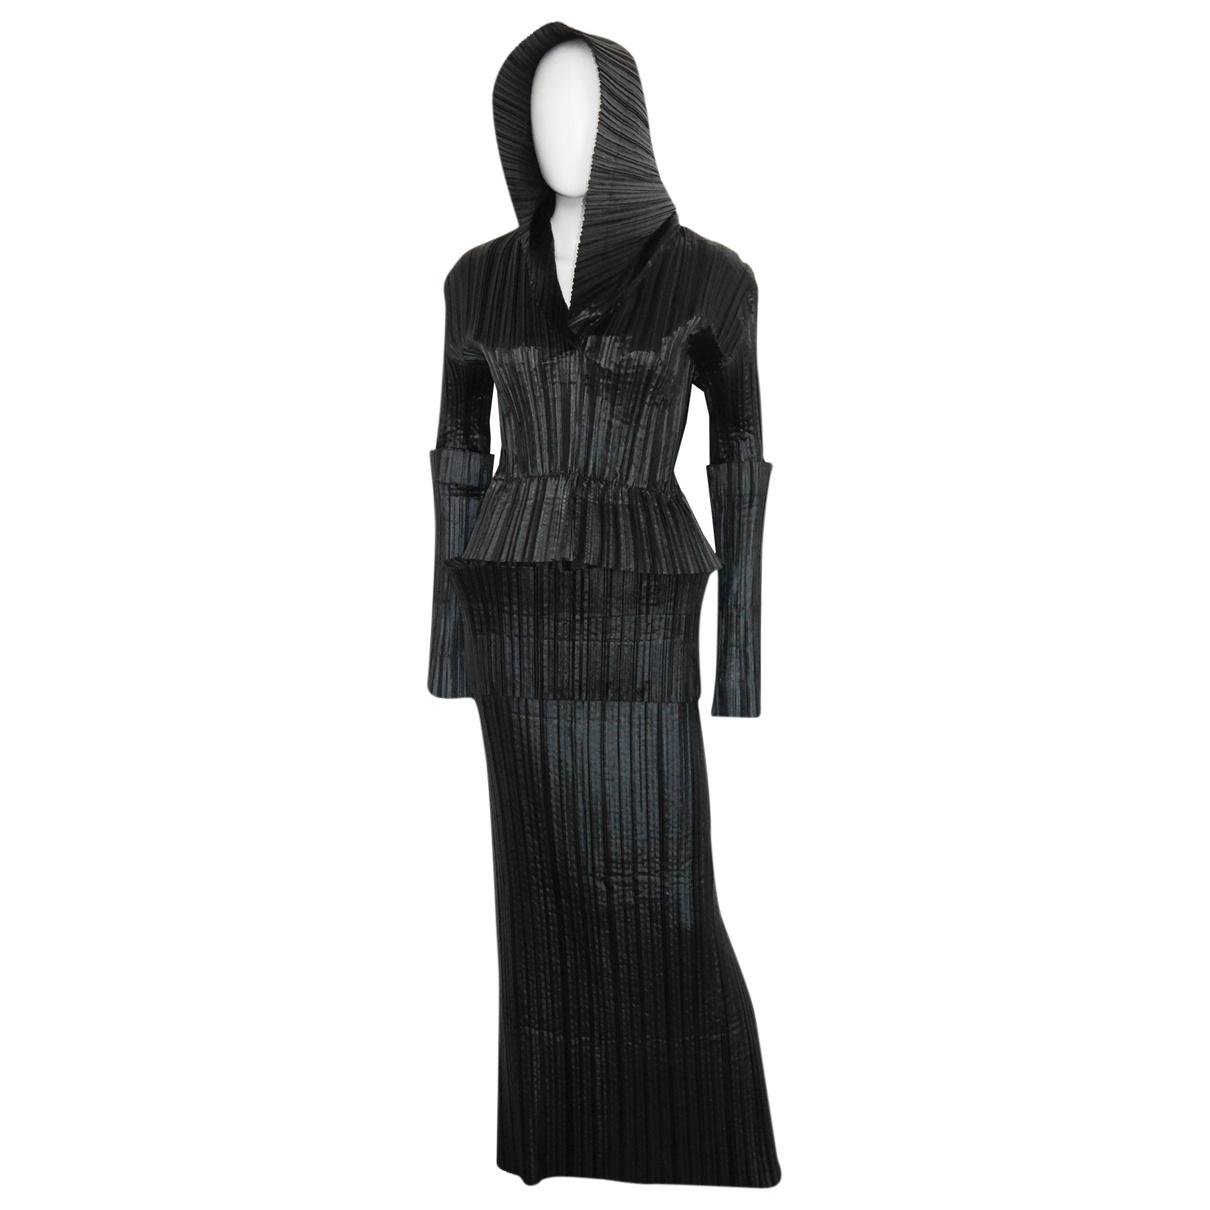 Issey Miyake \N Anthracite dress for Women M International